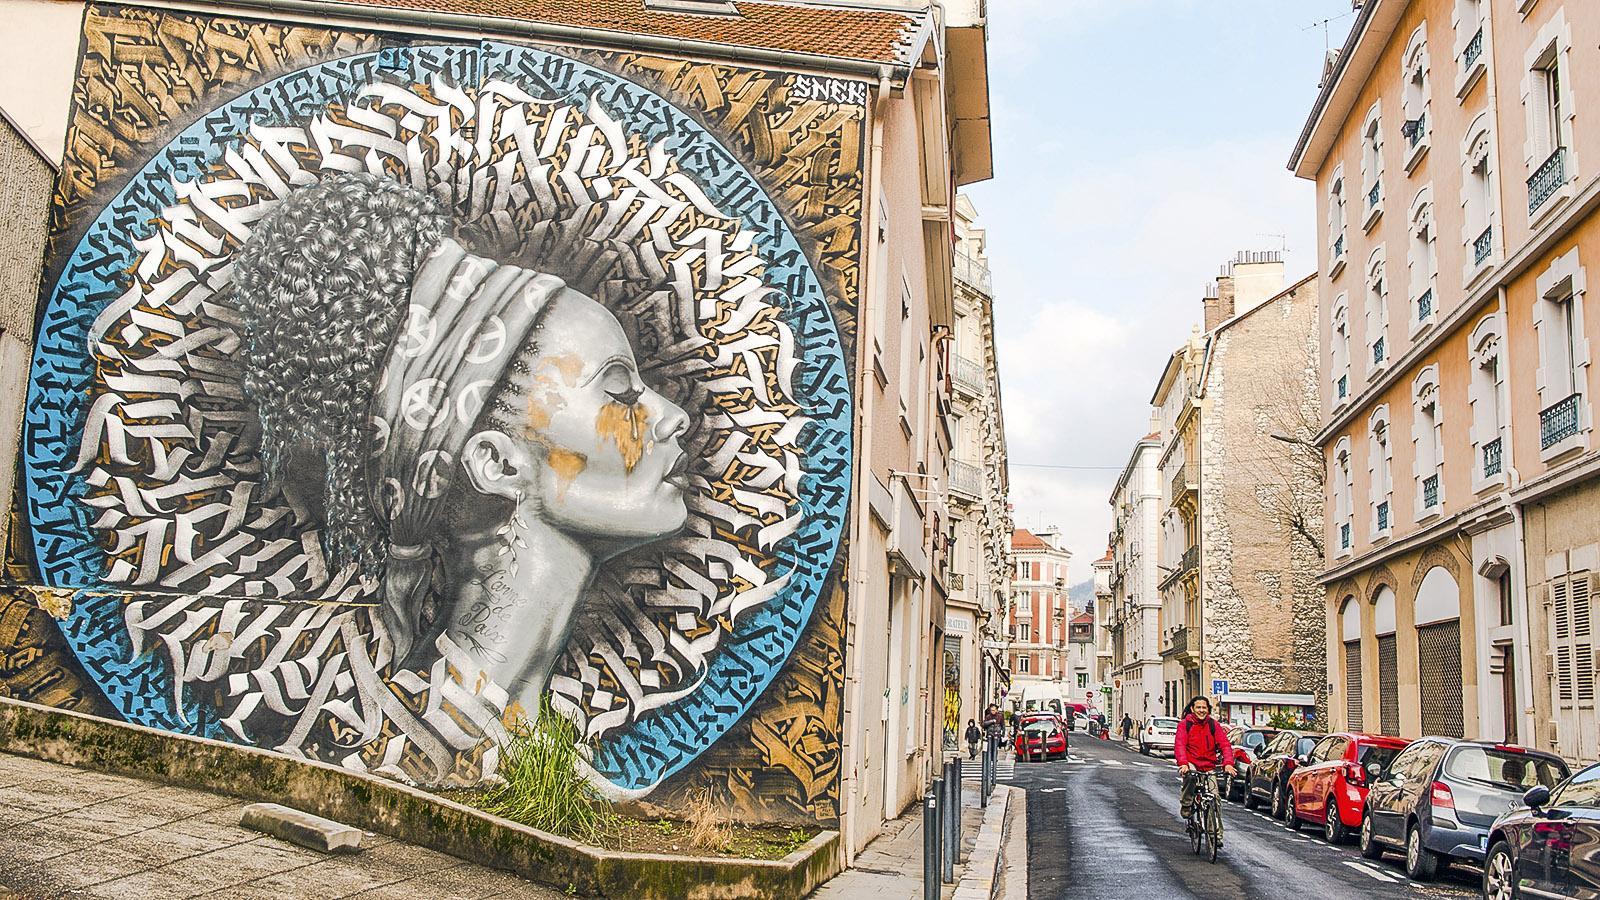 L'arme de paix von Snek, Beitrag zum Street-Art-Festival 2019